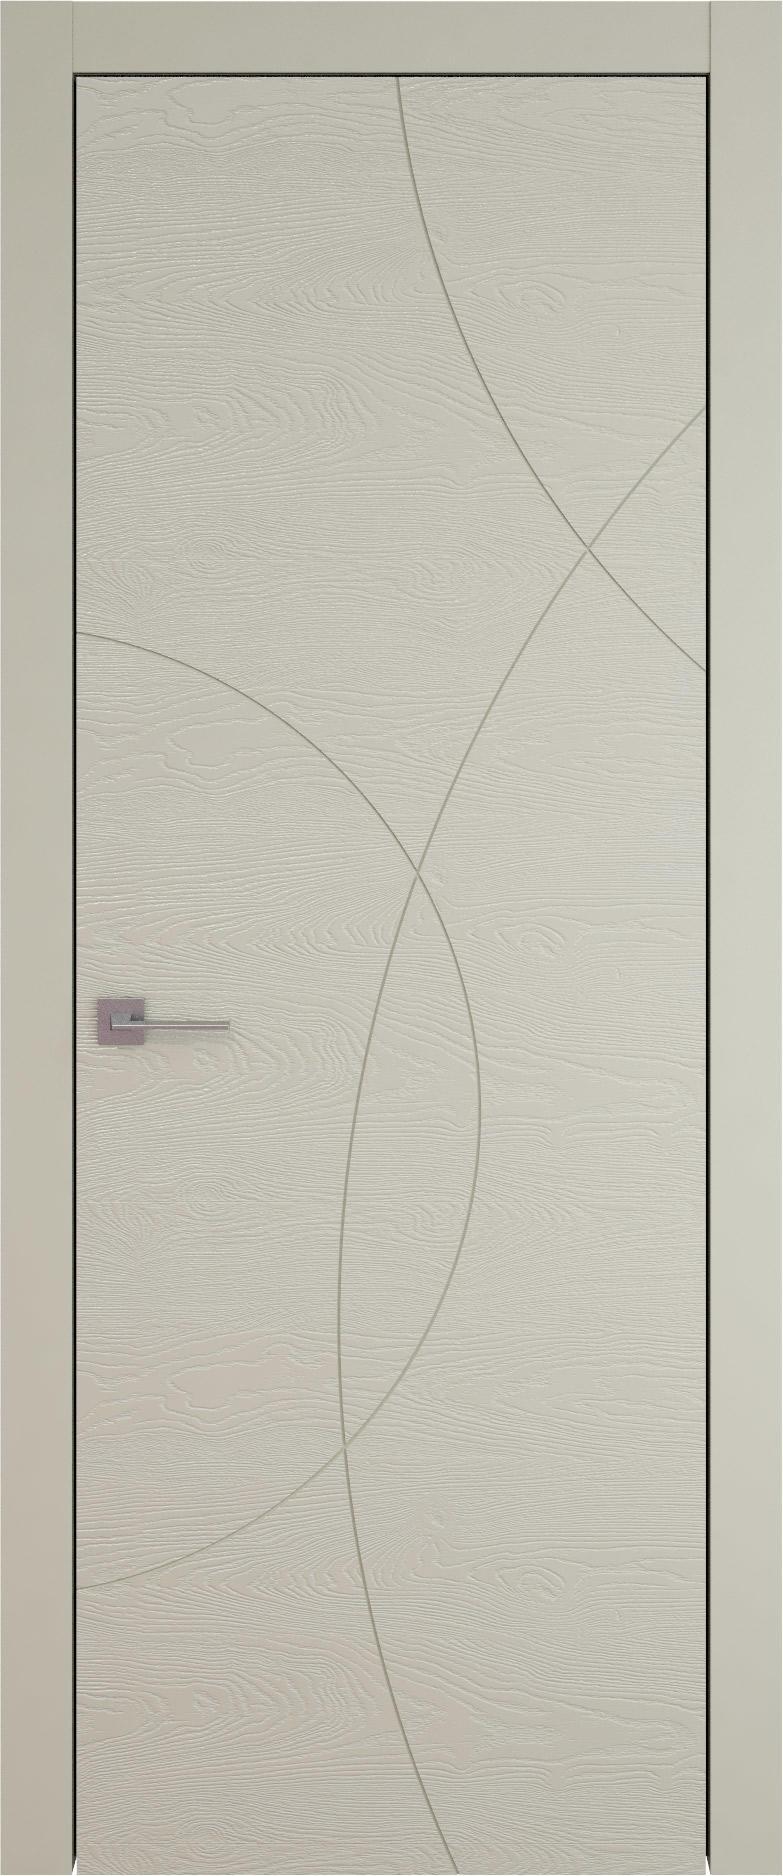 Tivoli Б-5 цвет - Серо-оливковая эмаль по шпону (RAL 7032) Без стекла (ДГ)